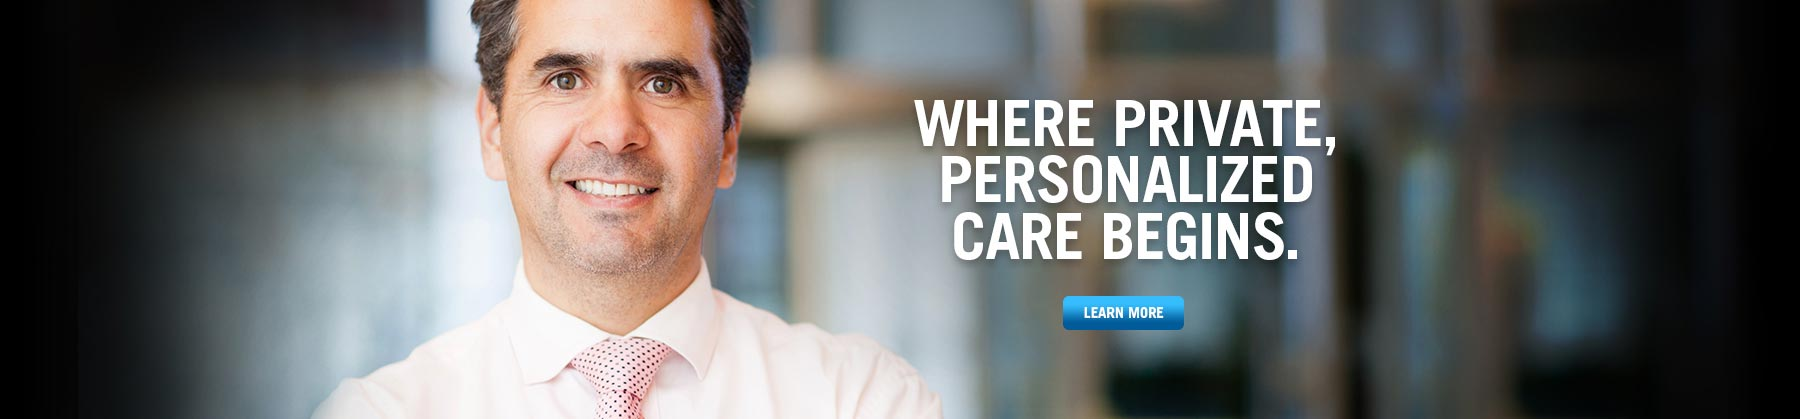 Where Private, Personalized Care Begins.